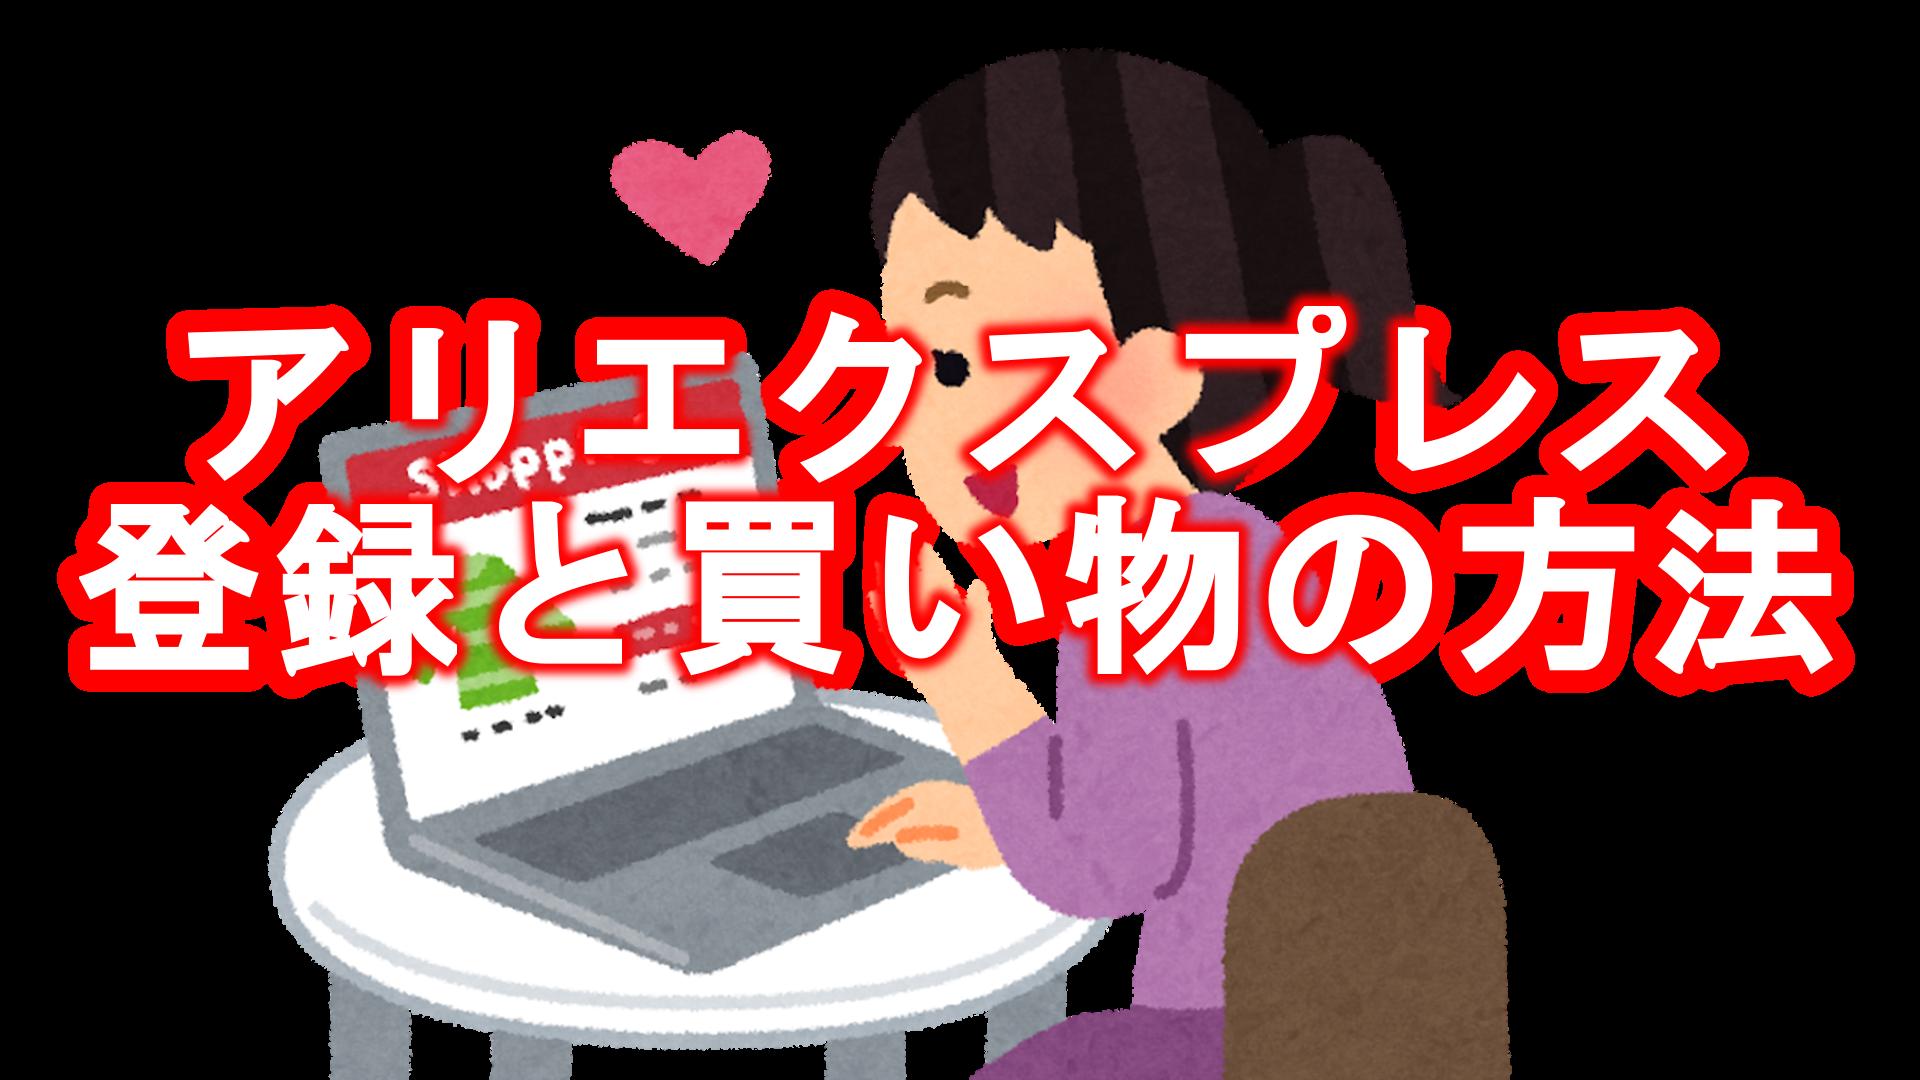 【AliExpress】アリエクスプレス日本円で簡単購入♪日本語での登録方法と買い方